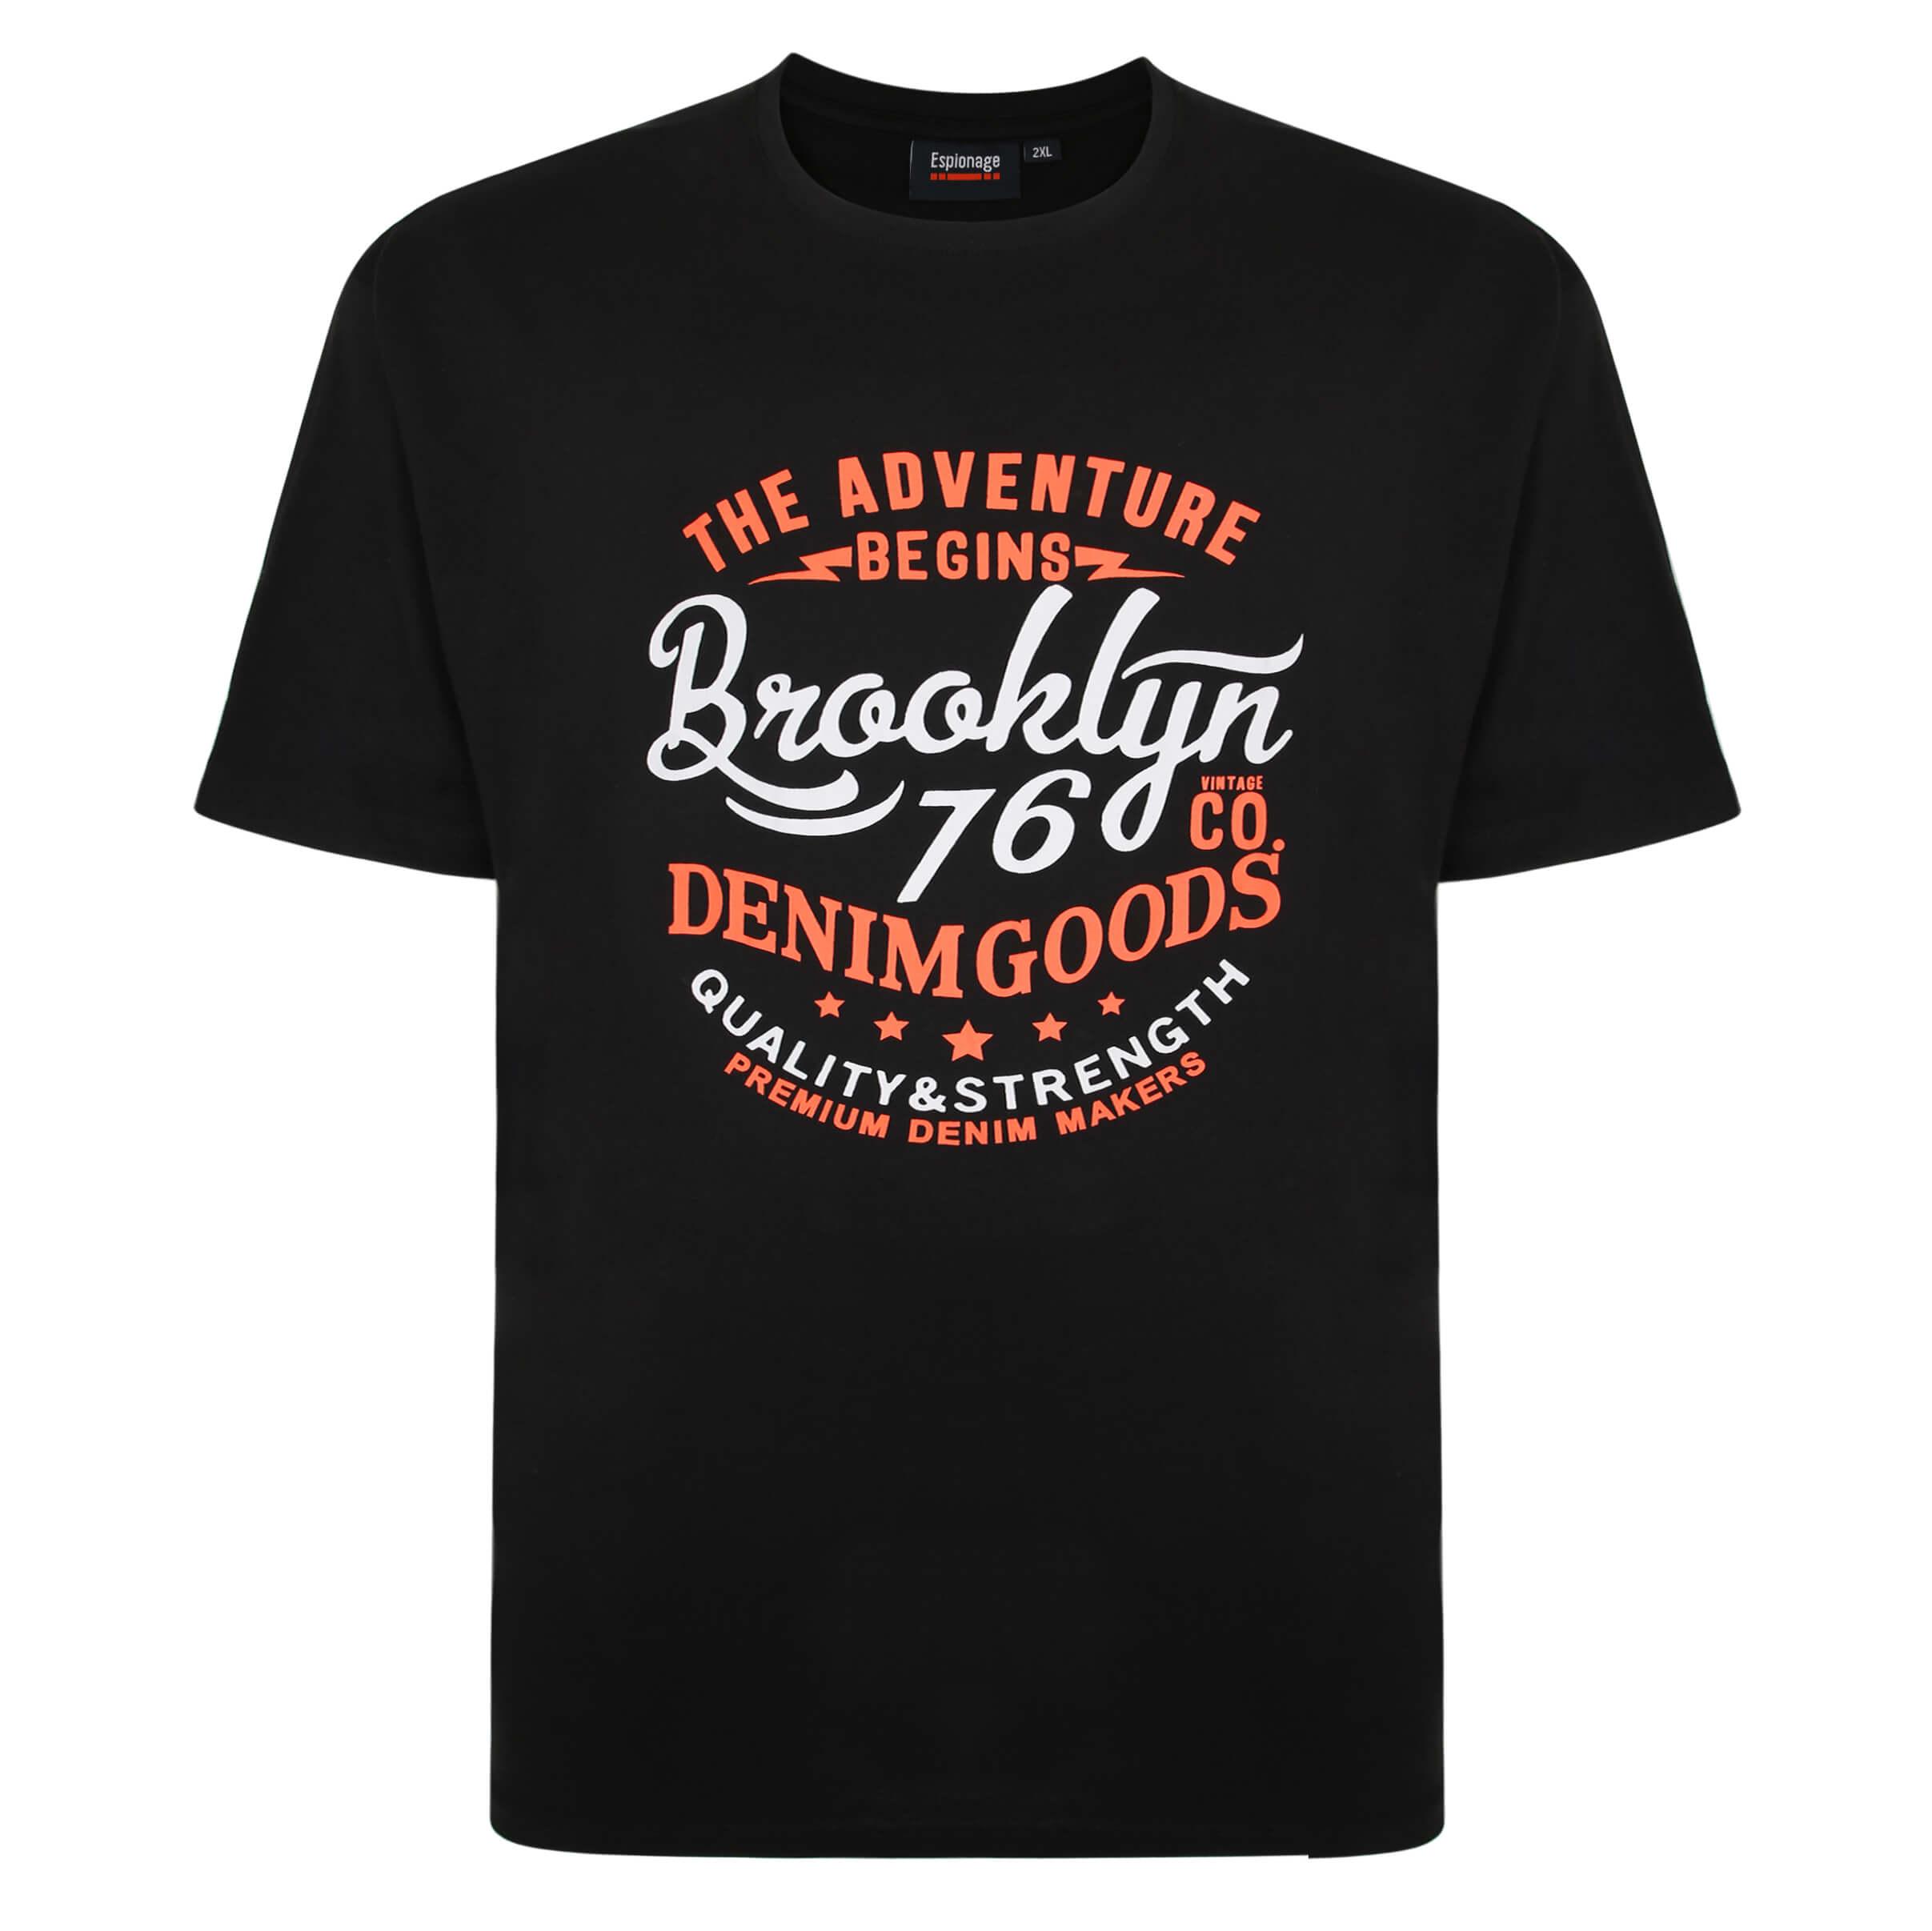 Espionage Black Printed Tee Shirt